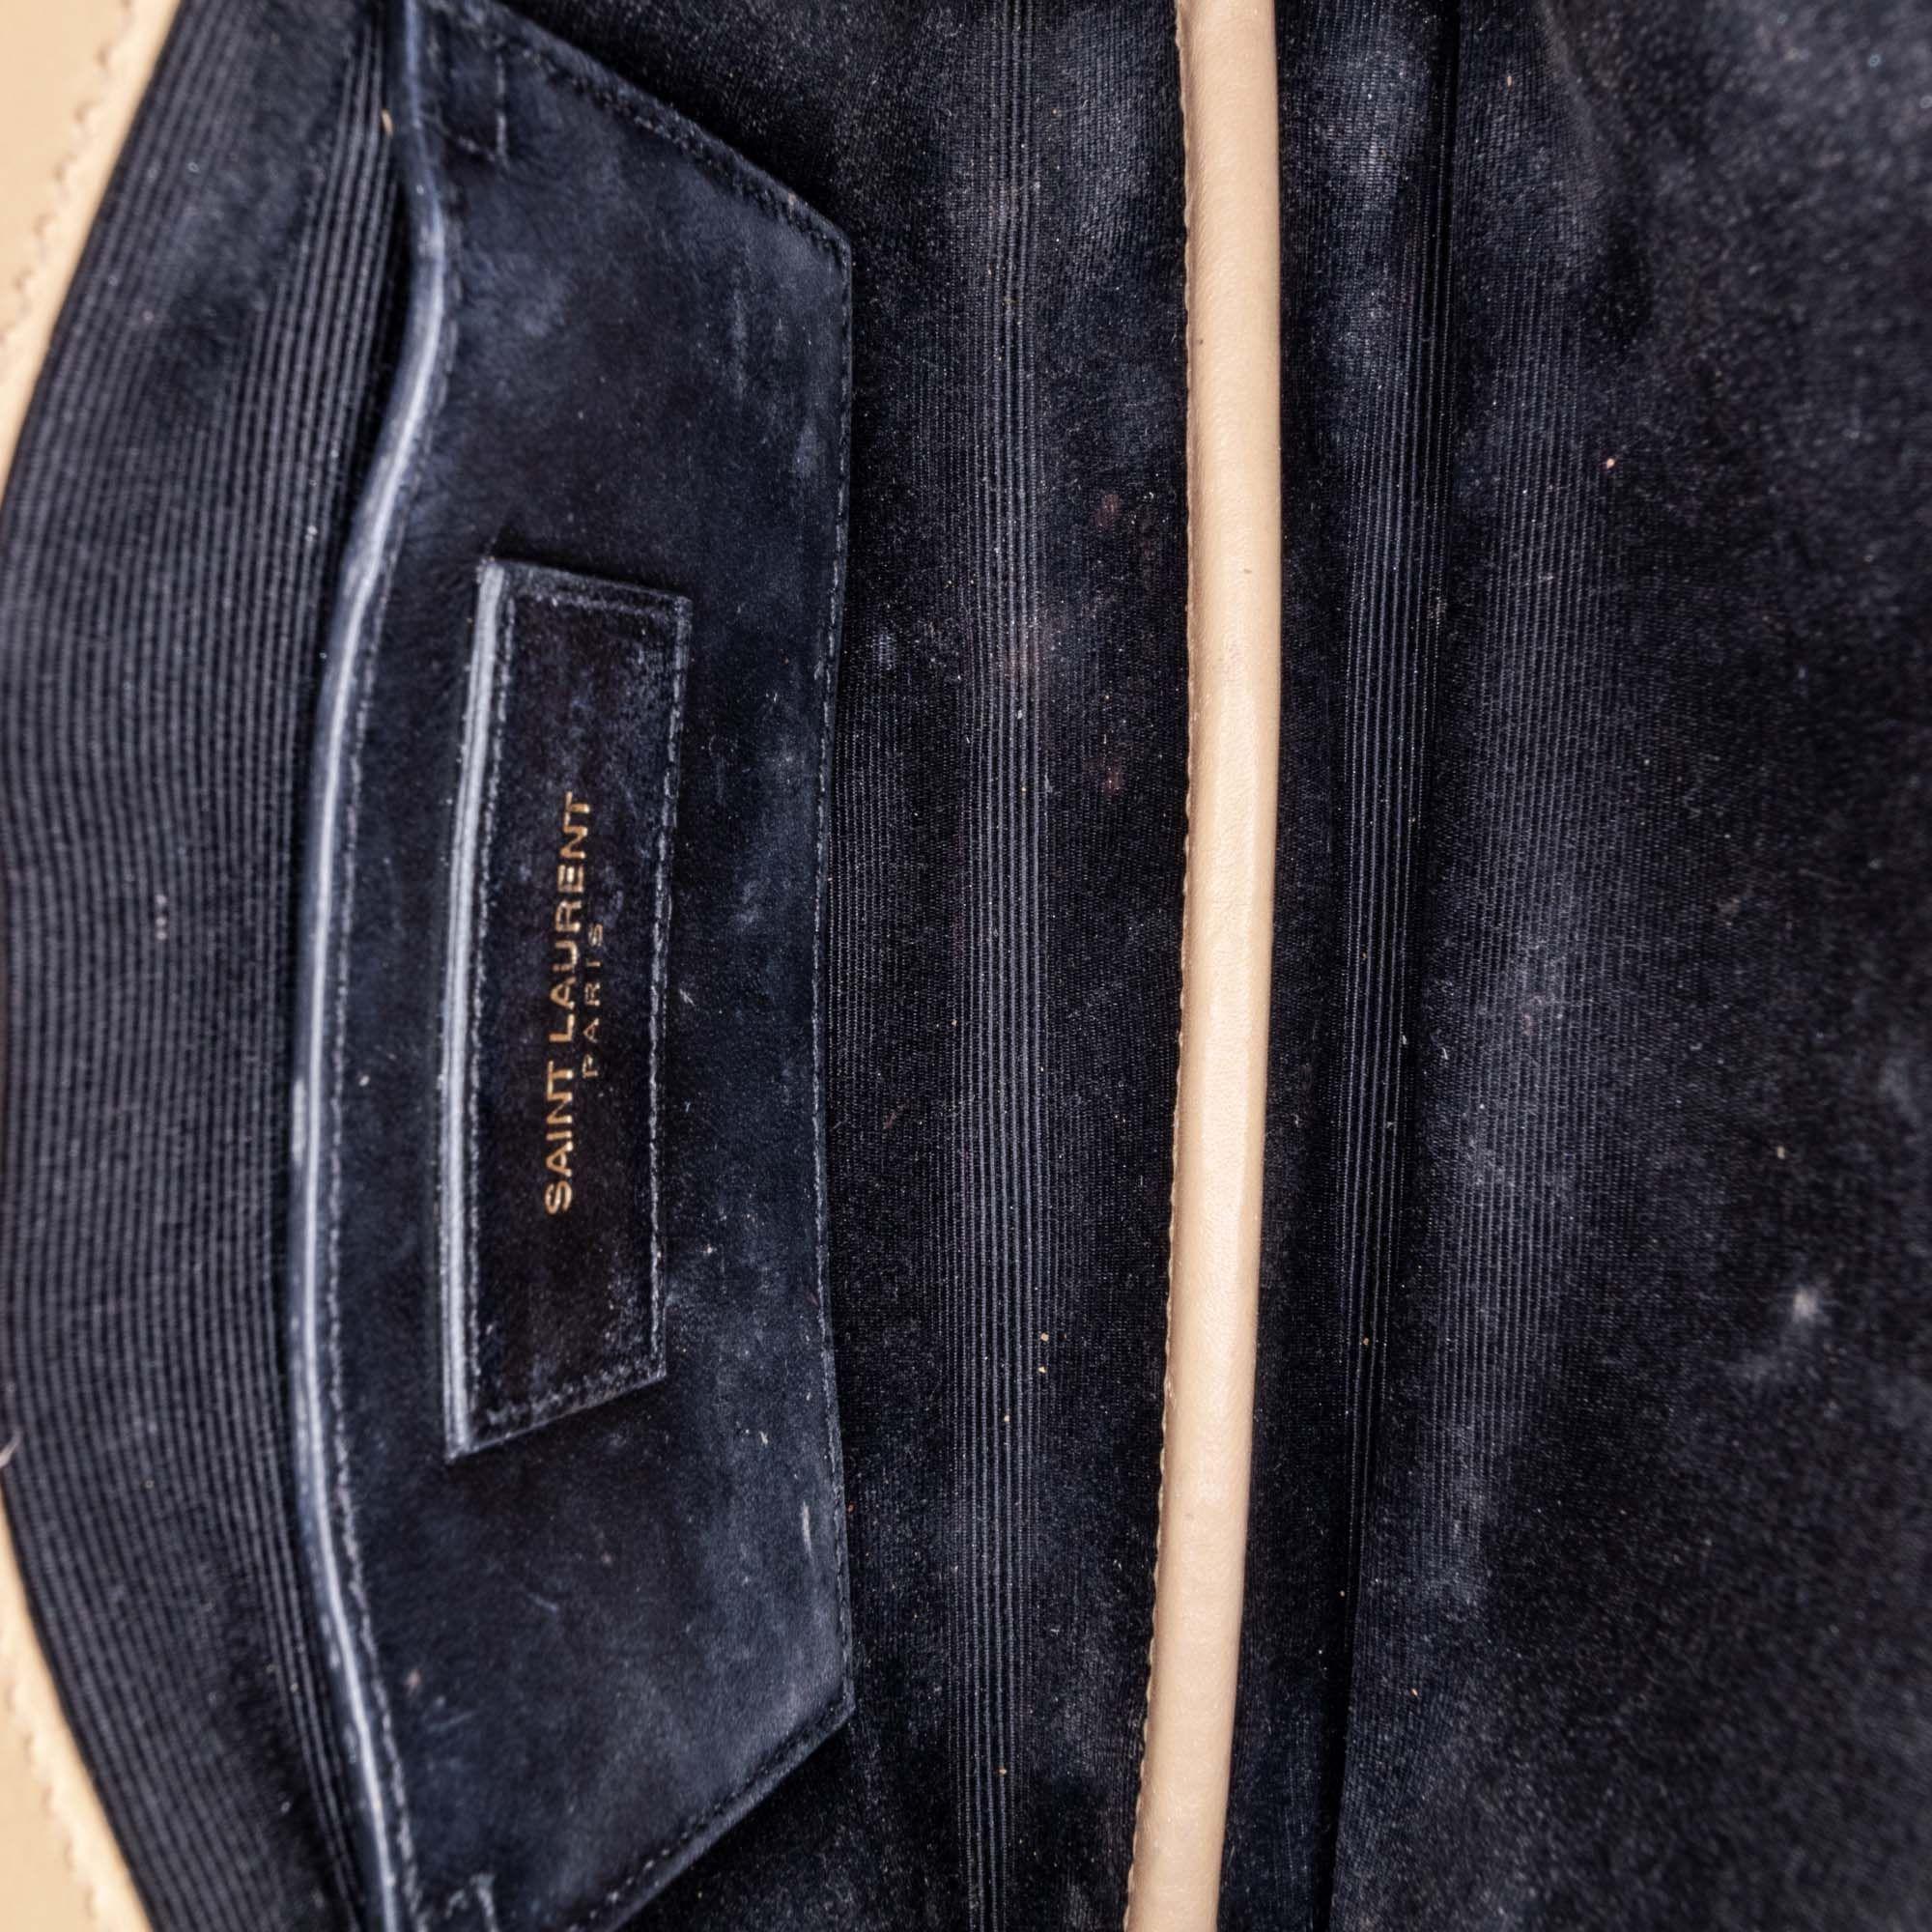 Vintage YSL Monogram Quilted Leather Clutch Bag Brown